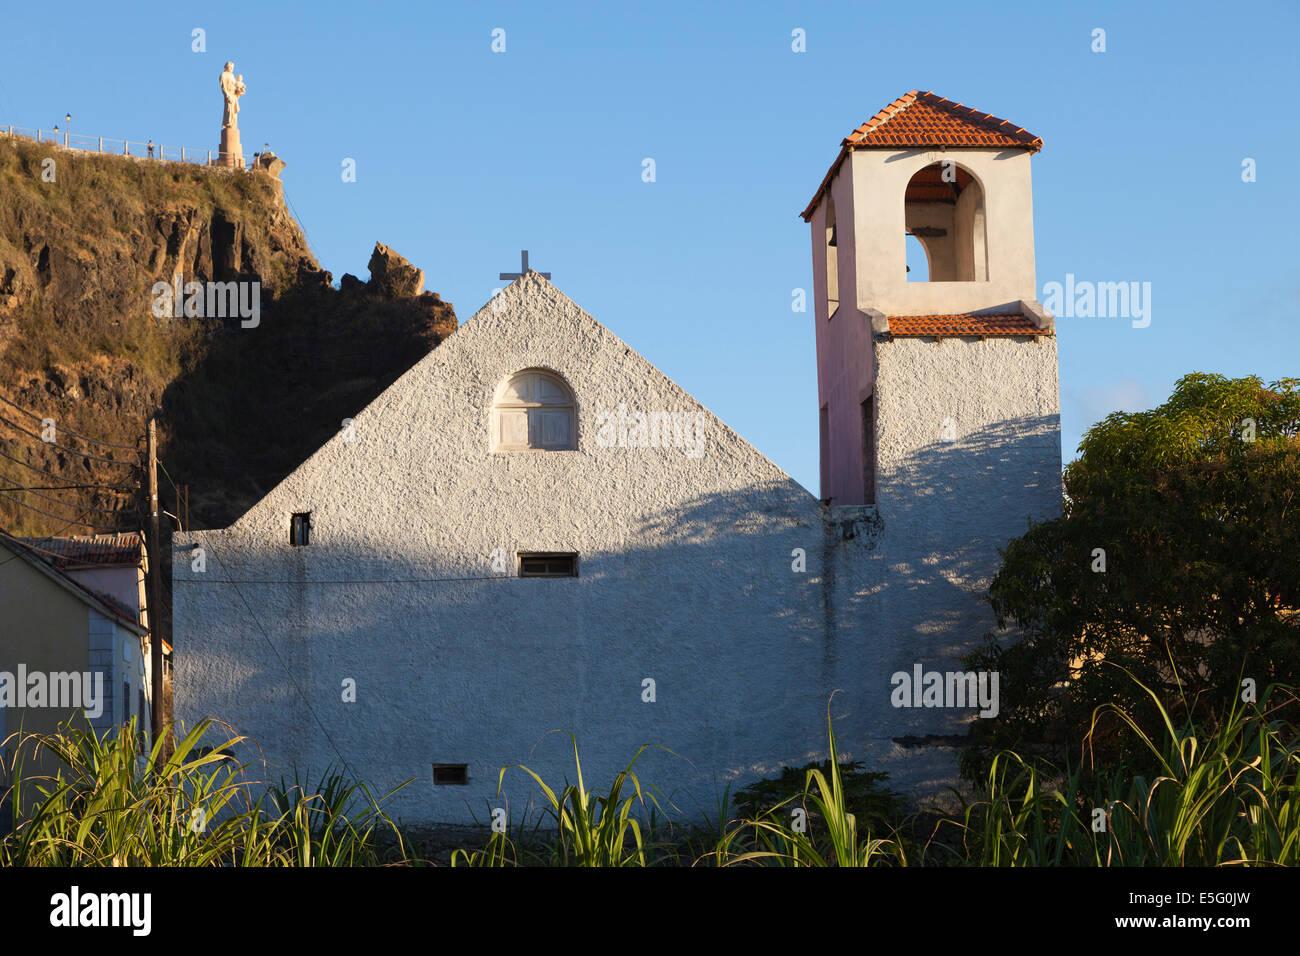 Paul, Santo Antao, Cape Verde Islands, Africa - Stock Image